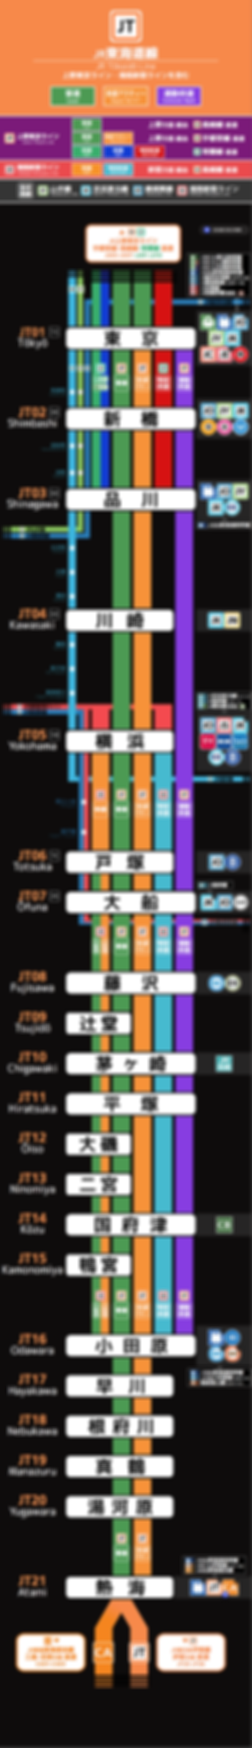 JR東海道線_7_2019-04-26_3.png